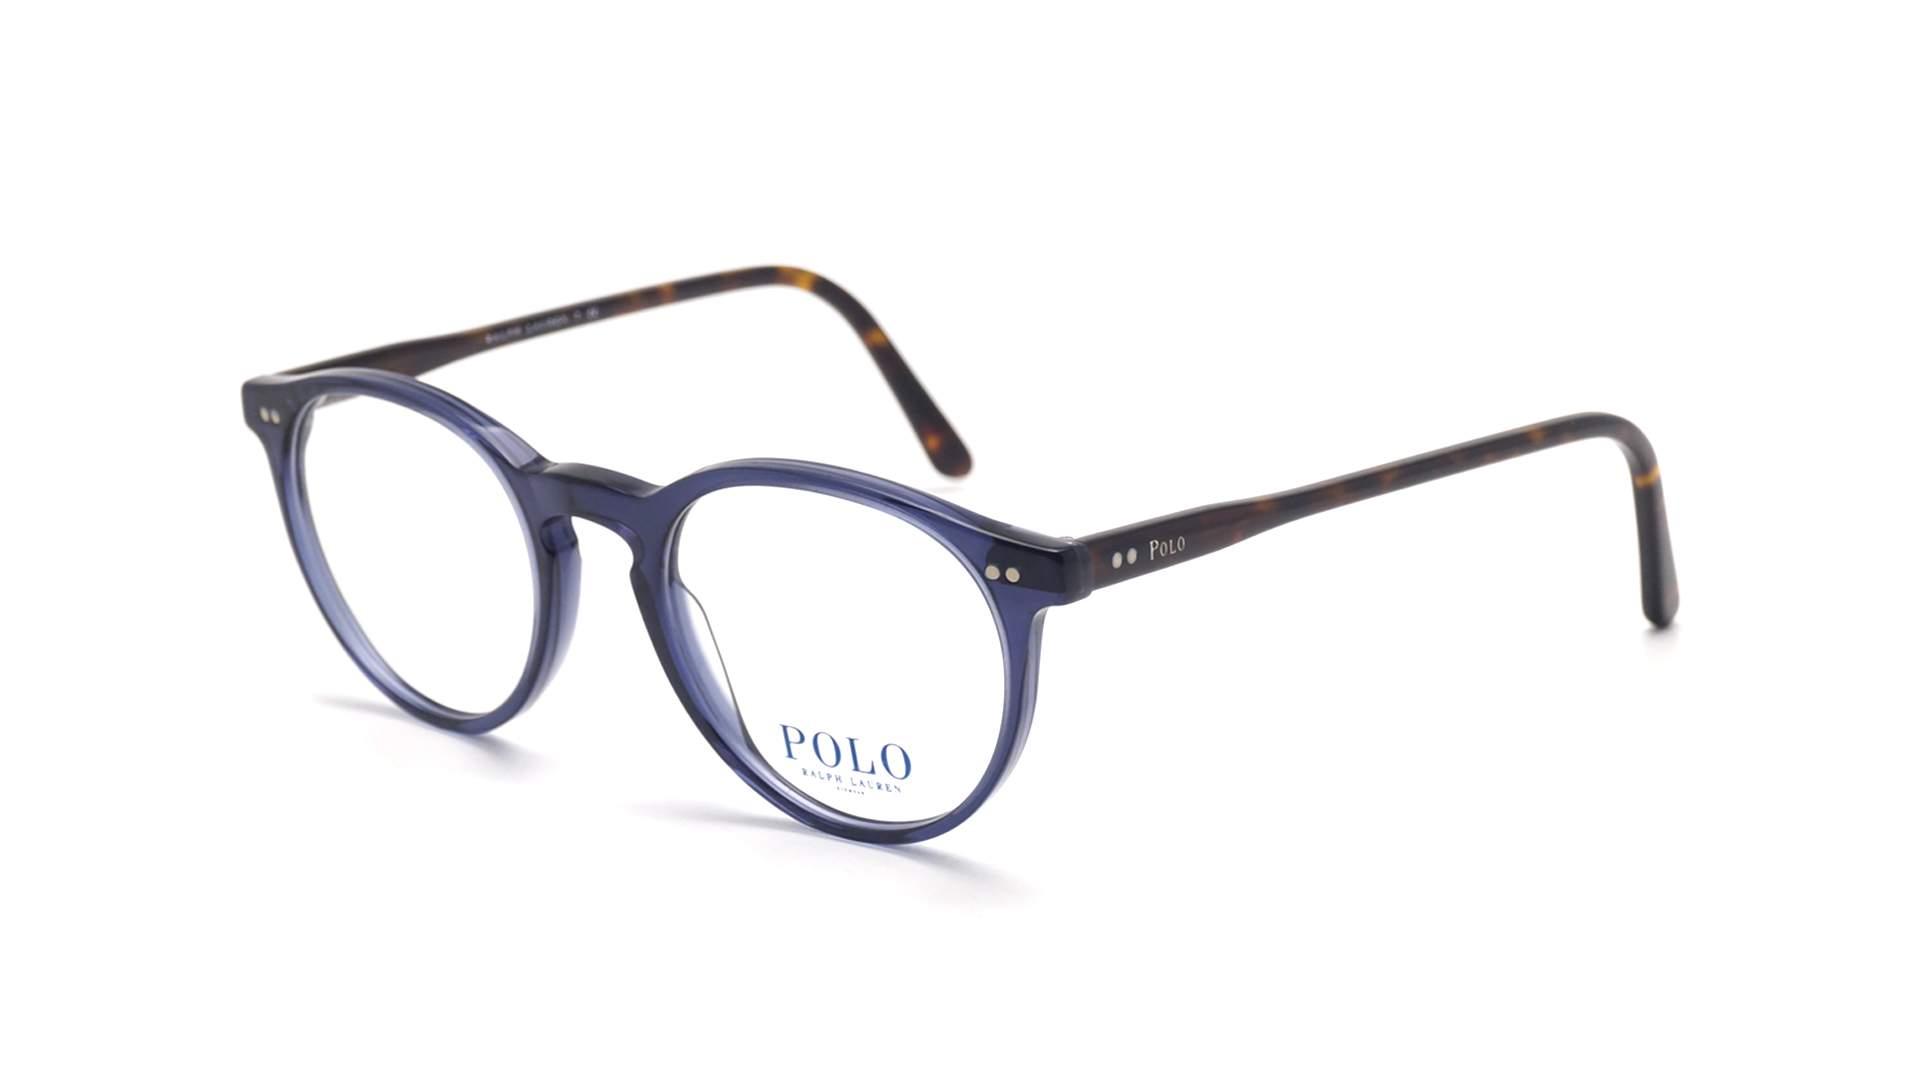 52a2e776c2e Eyeglasses Polo Ralph Lauren PH2083 5276 48-20 Blue Small